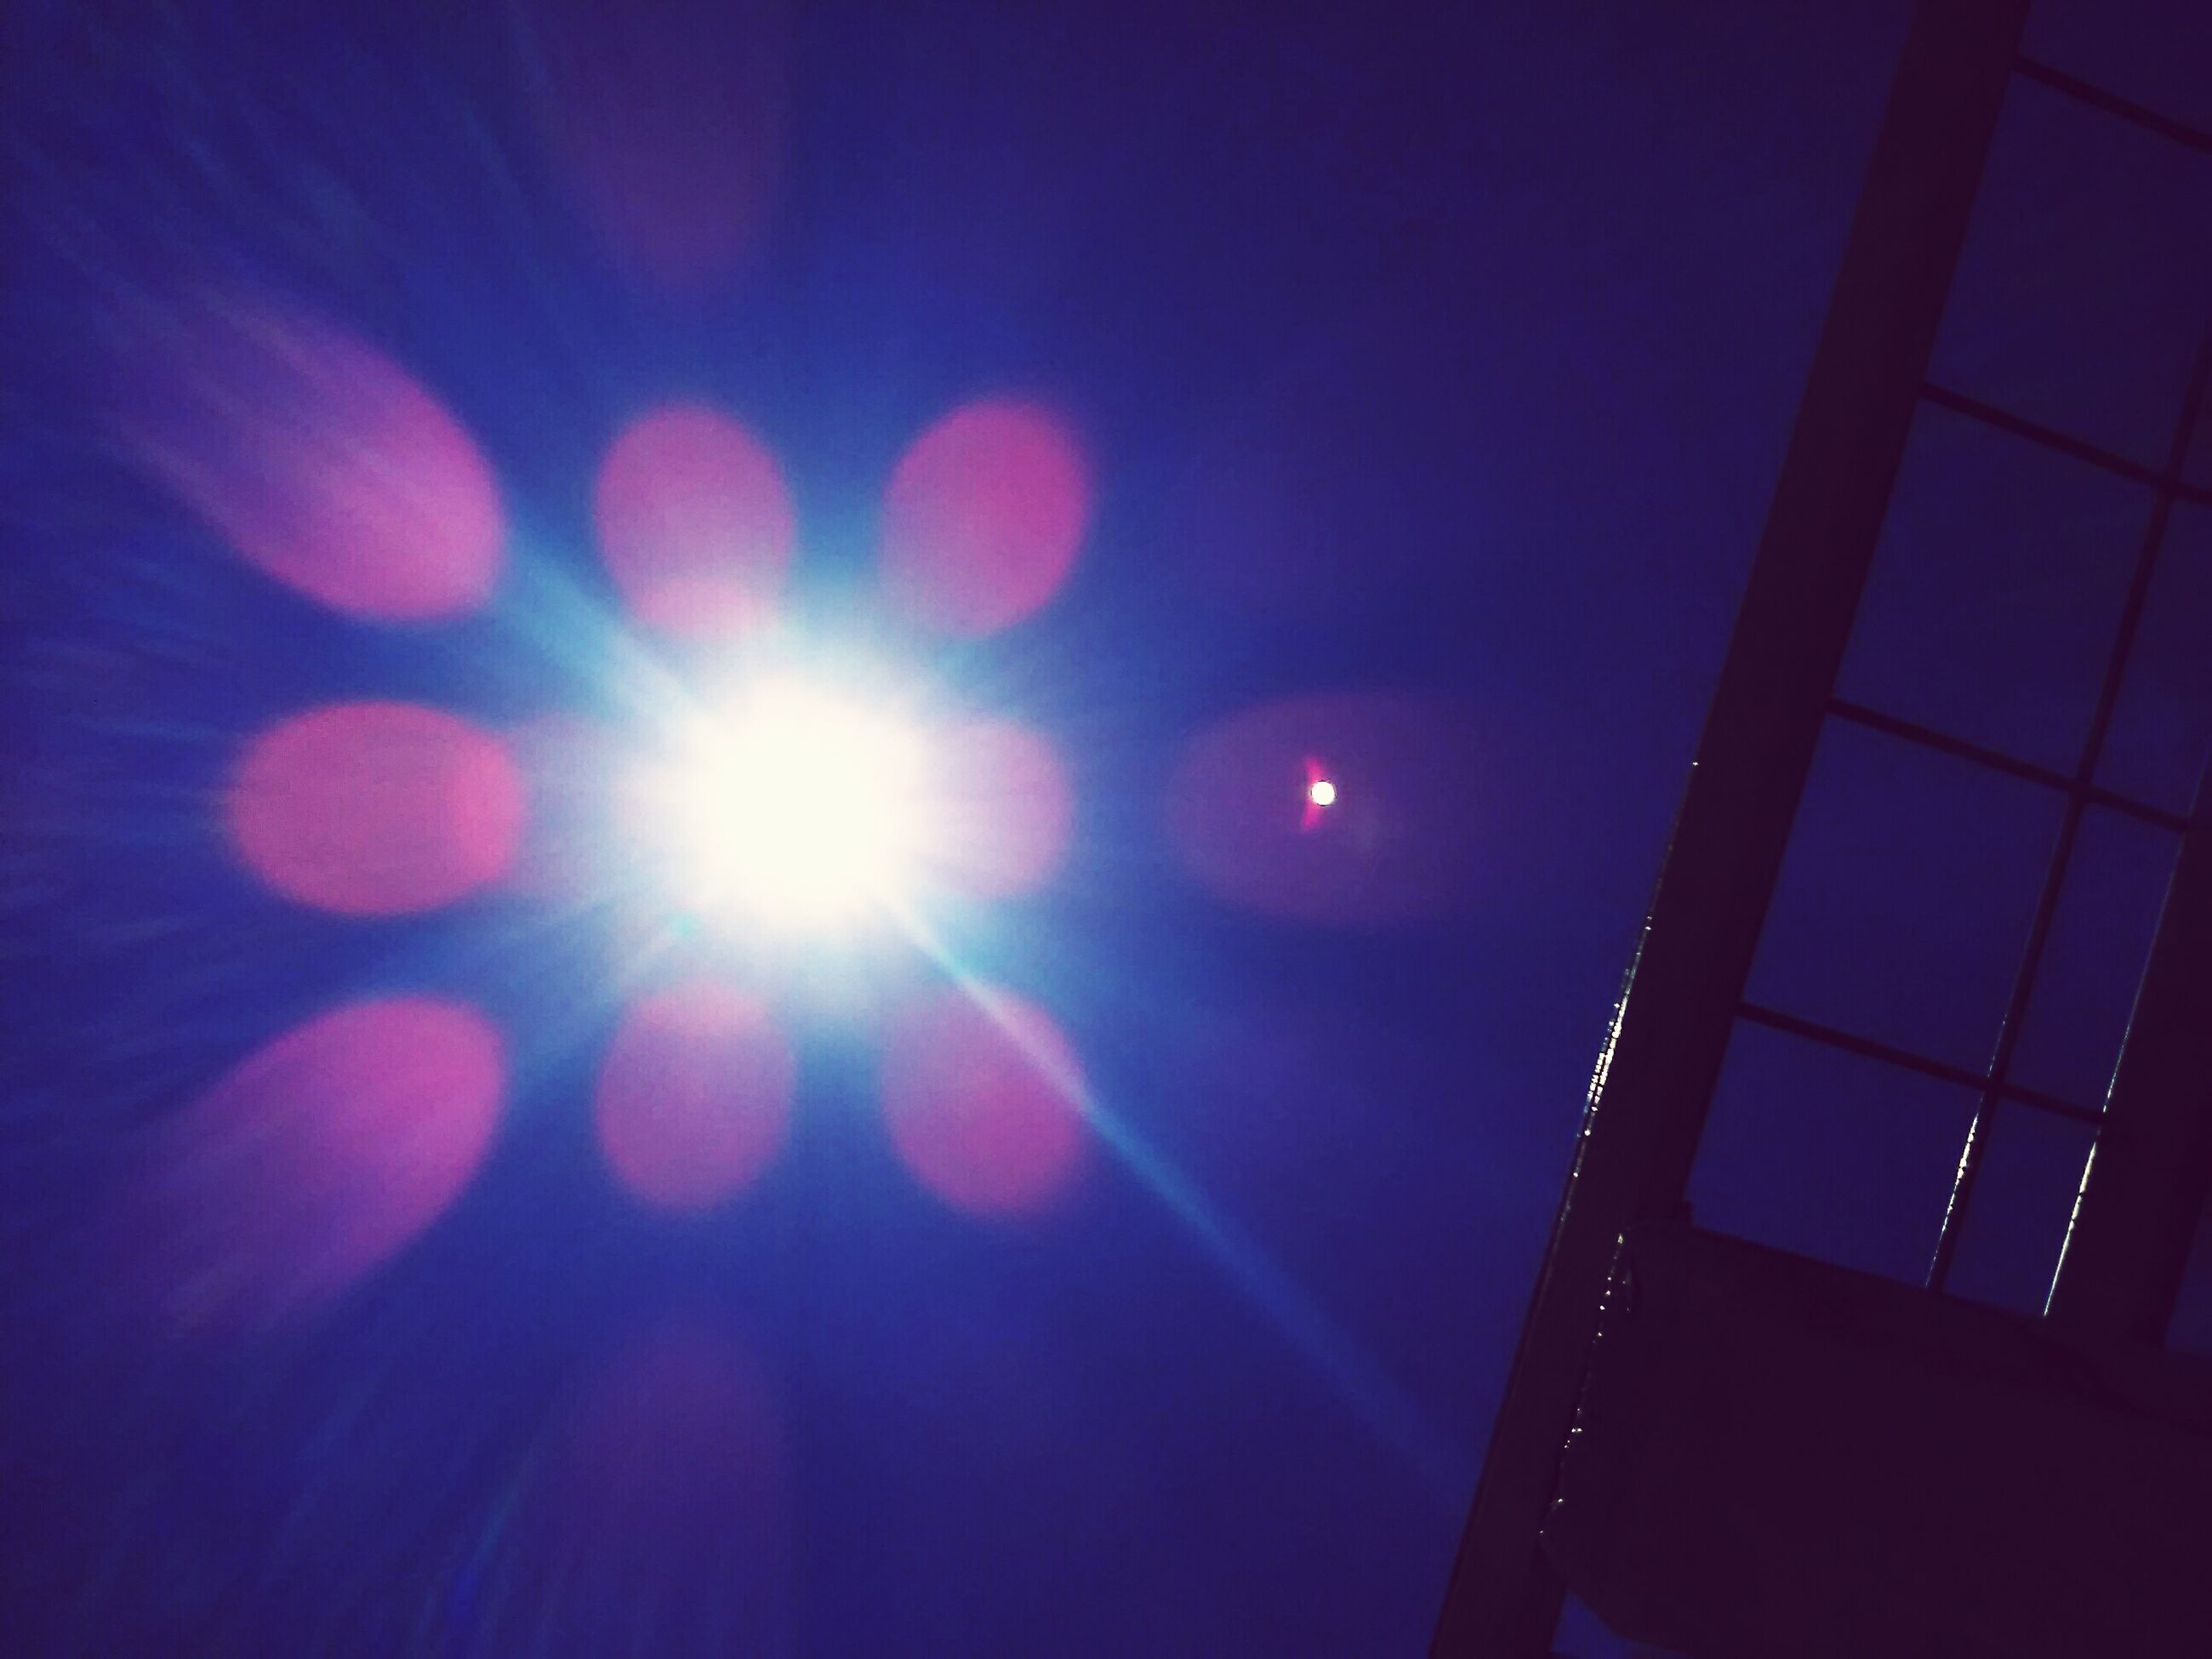 illuminated, no people, sun, lighting equipment, low angle view, sky, outdoors, close-up, nature, moon, spotlight, solar eclipse